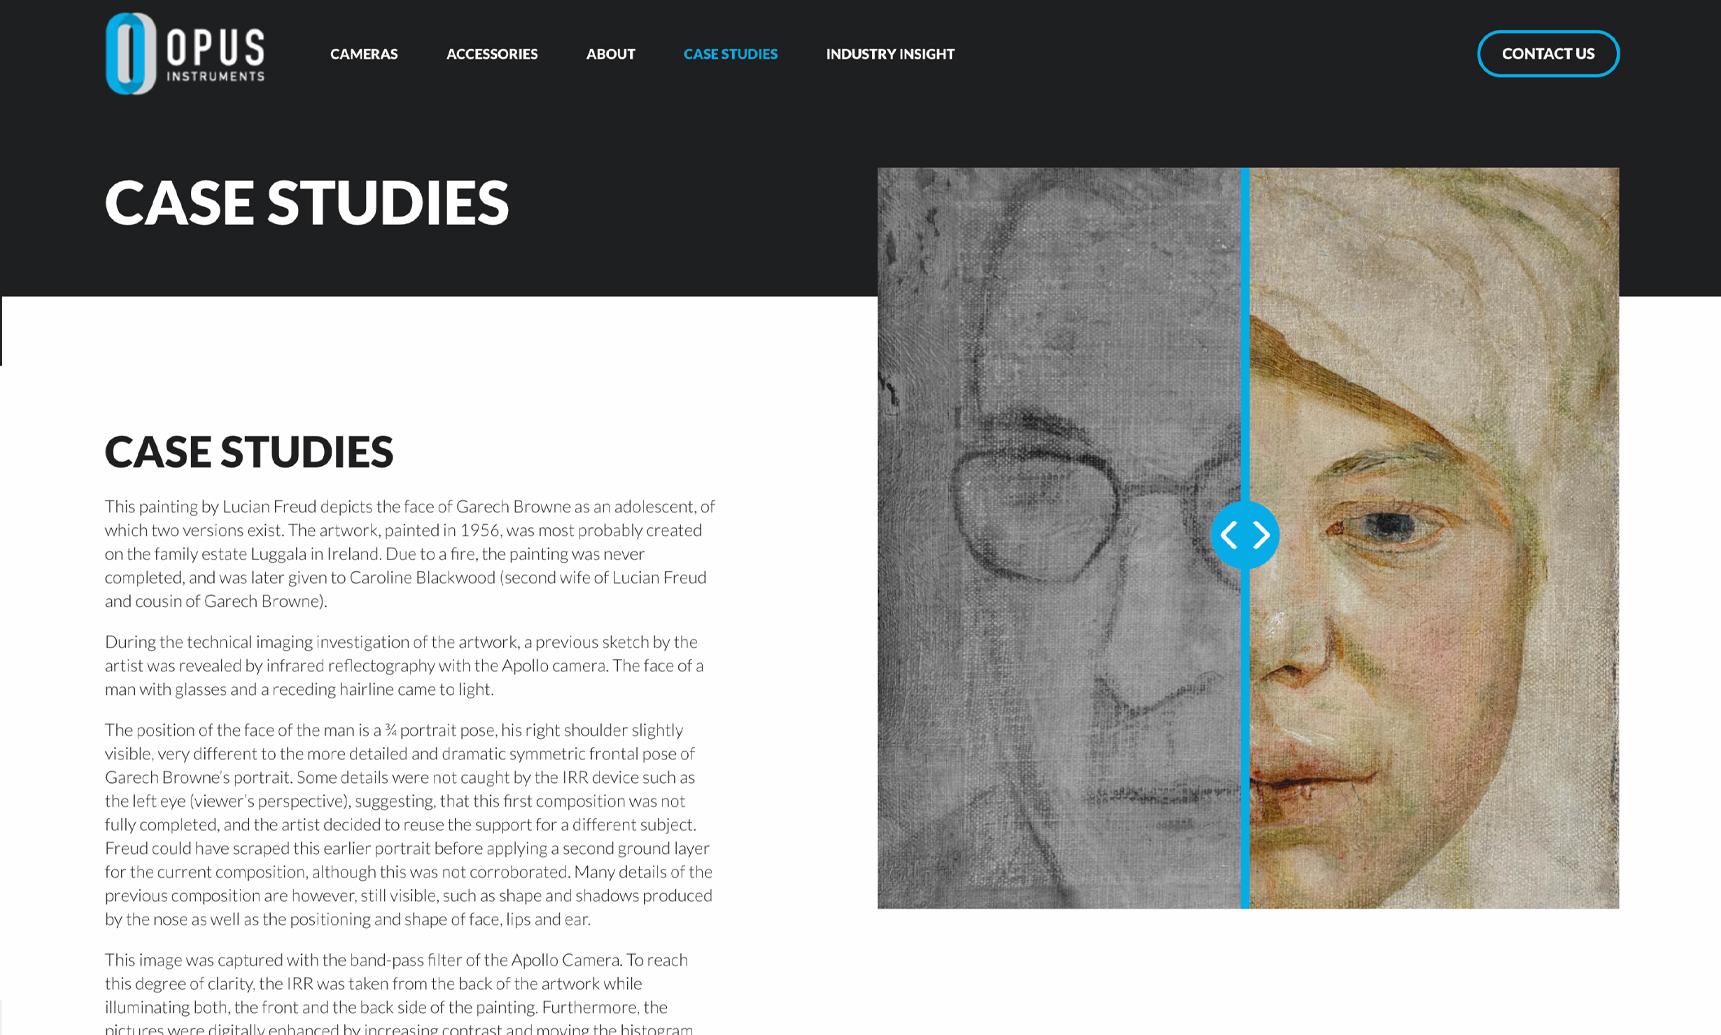 Case studies web build example